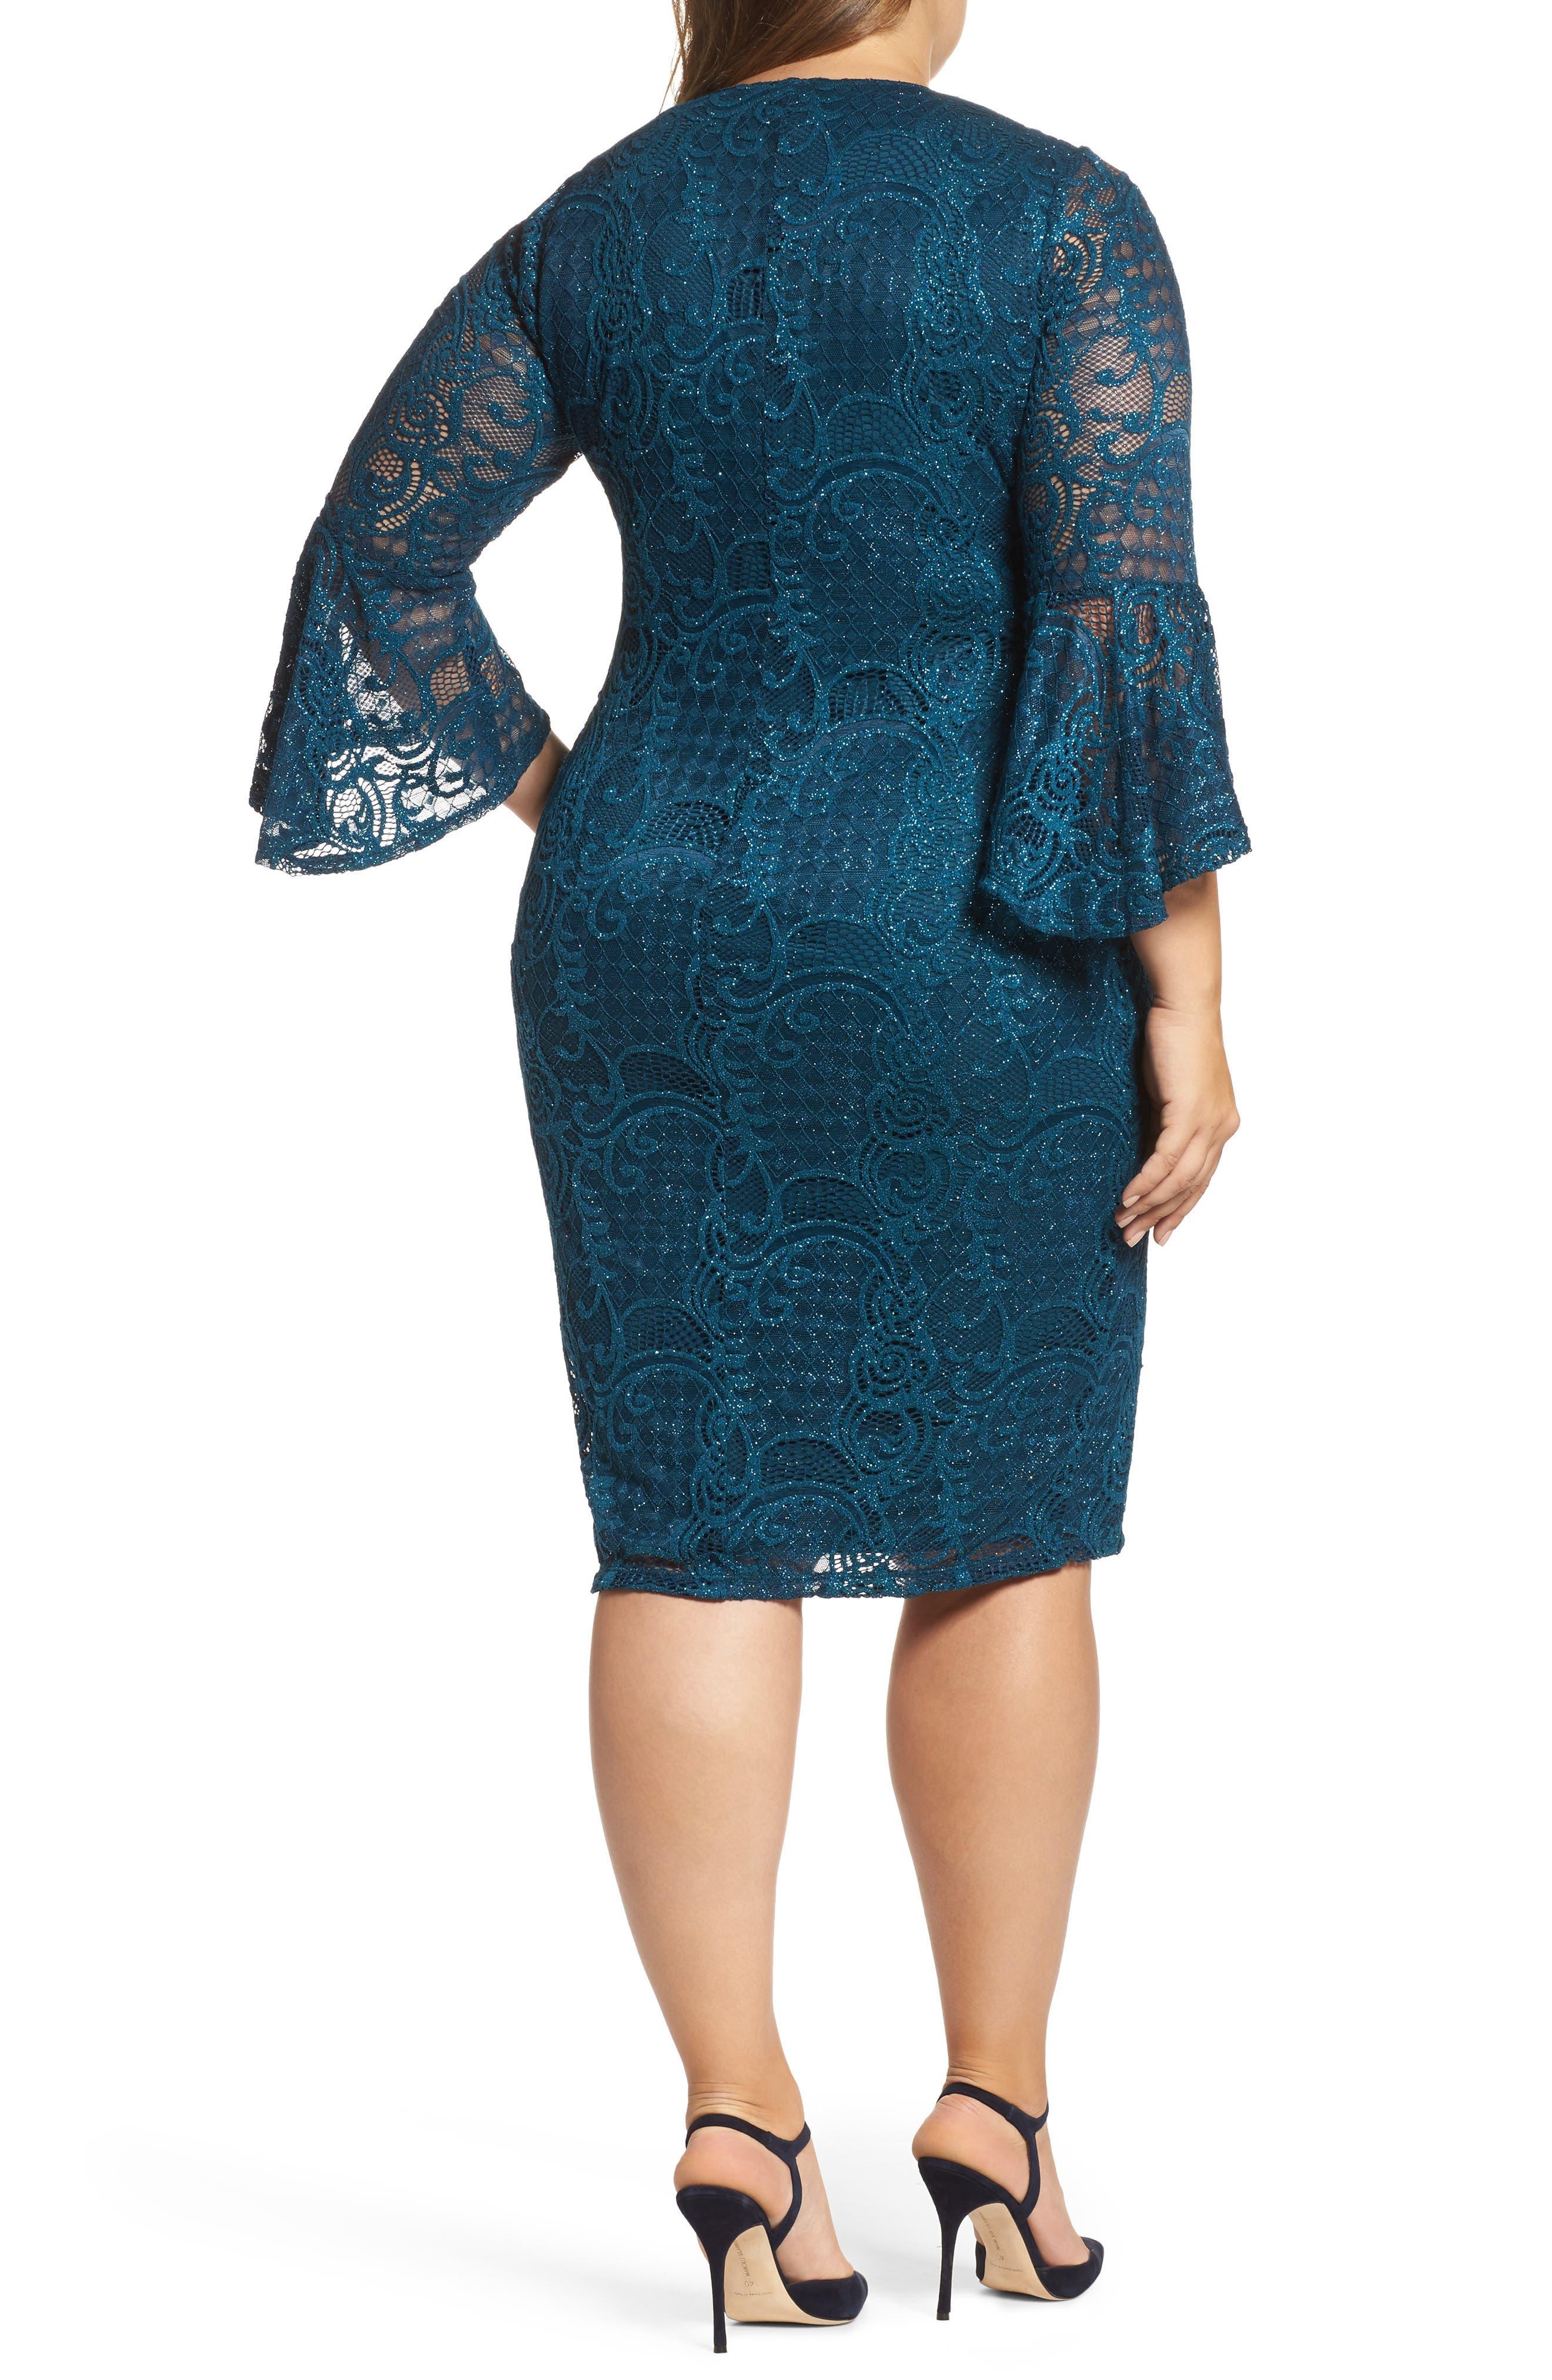 Bell Sleeve Glitter Lace Sheath Dress,                             Alternate thumbnail 2, color,                             412